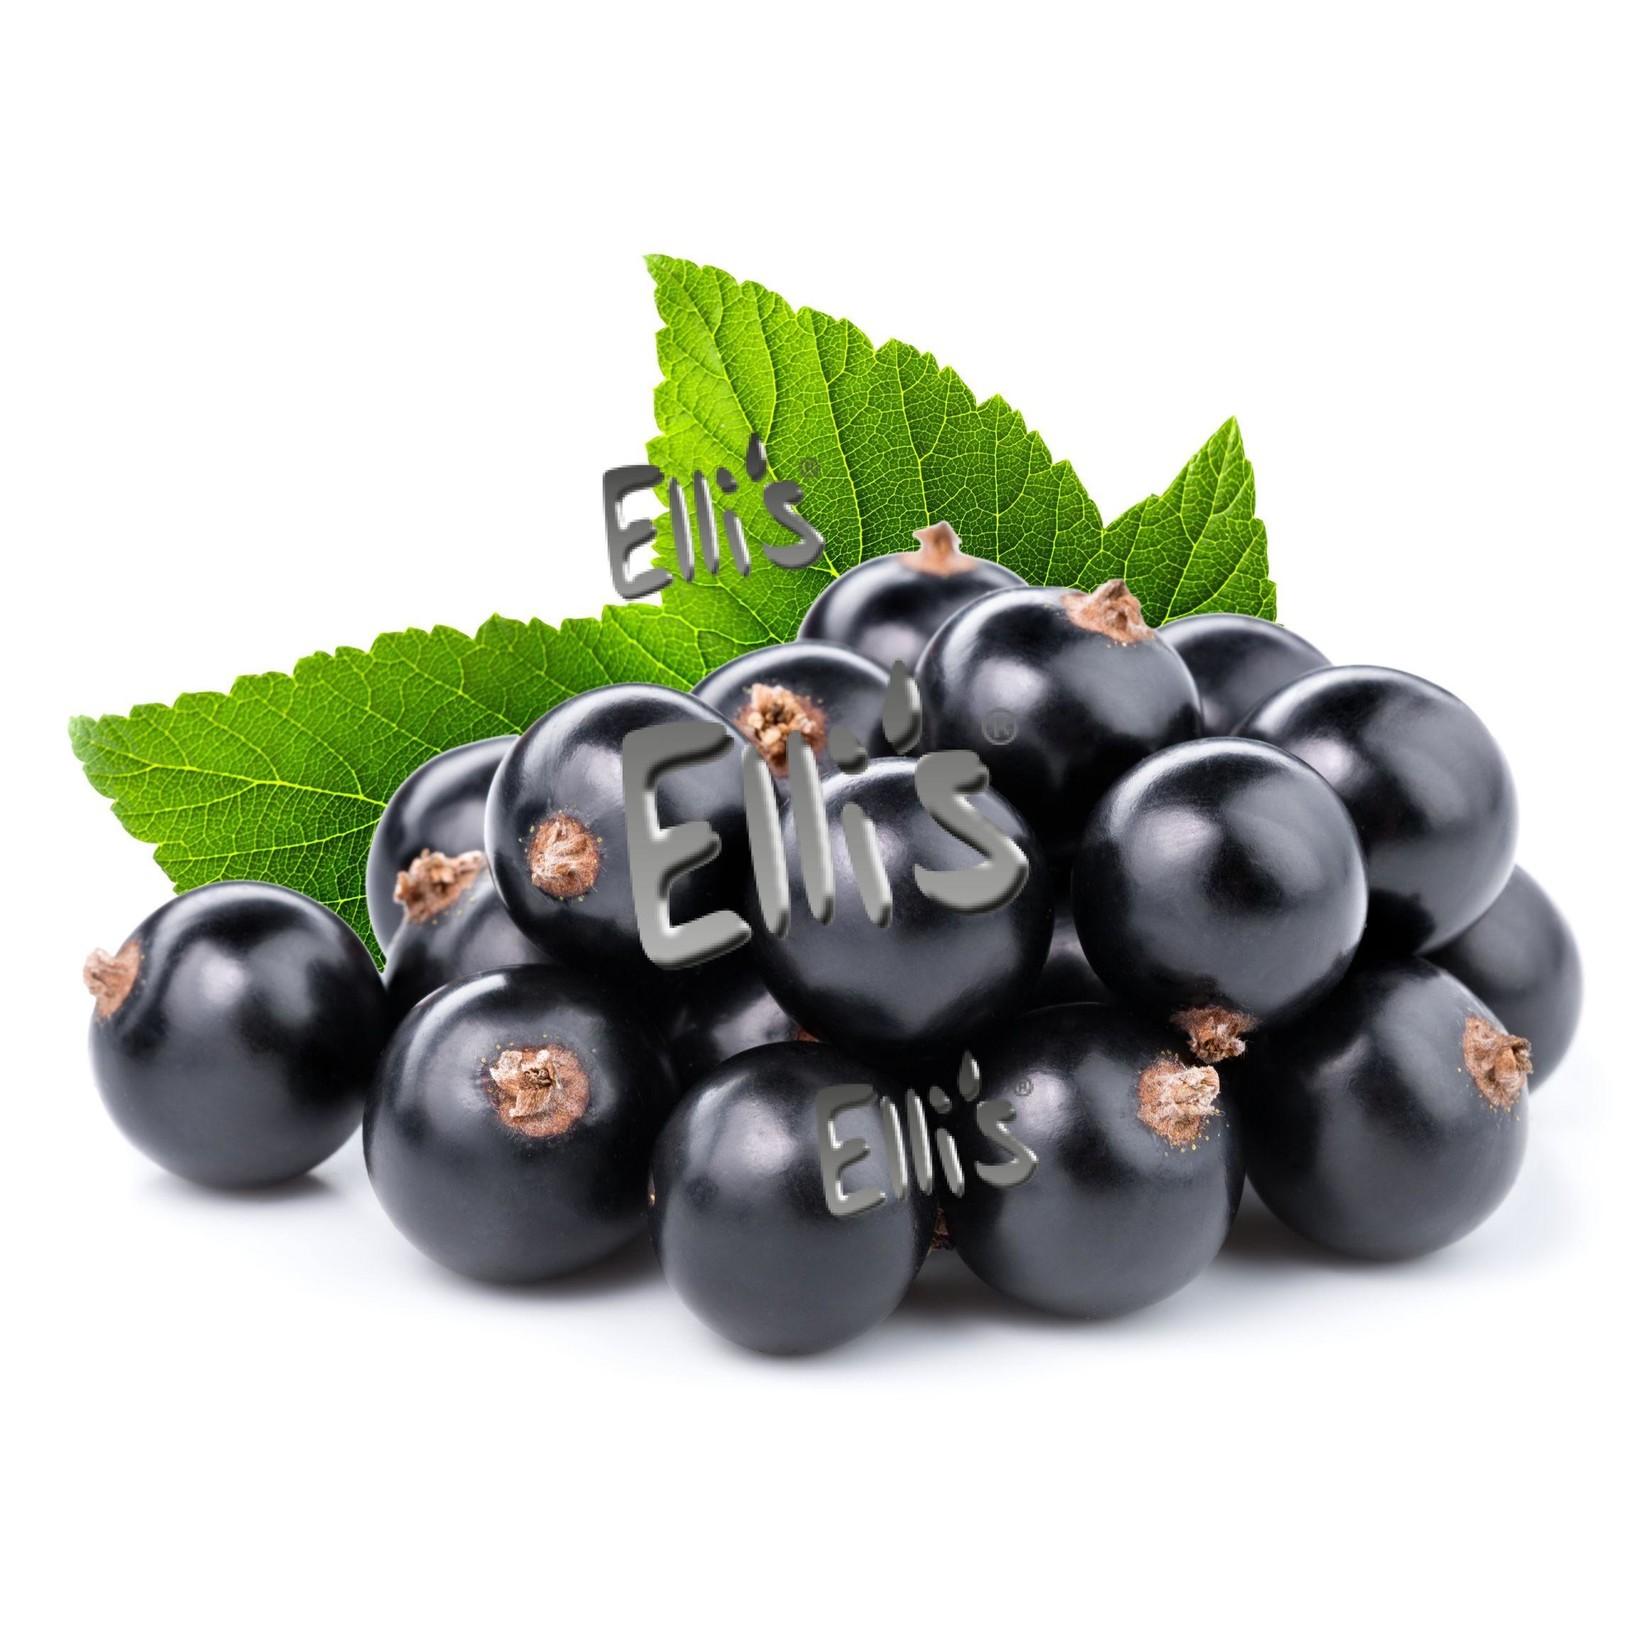 Schwarze Johannisbeere Aroma